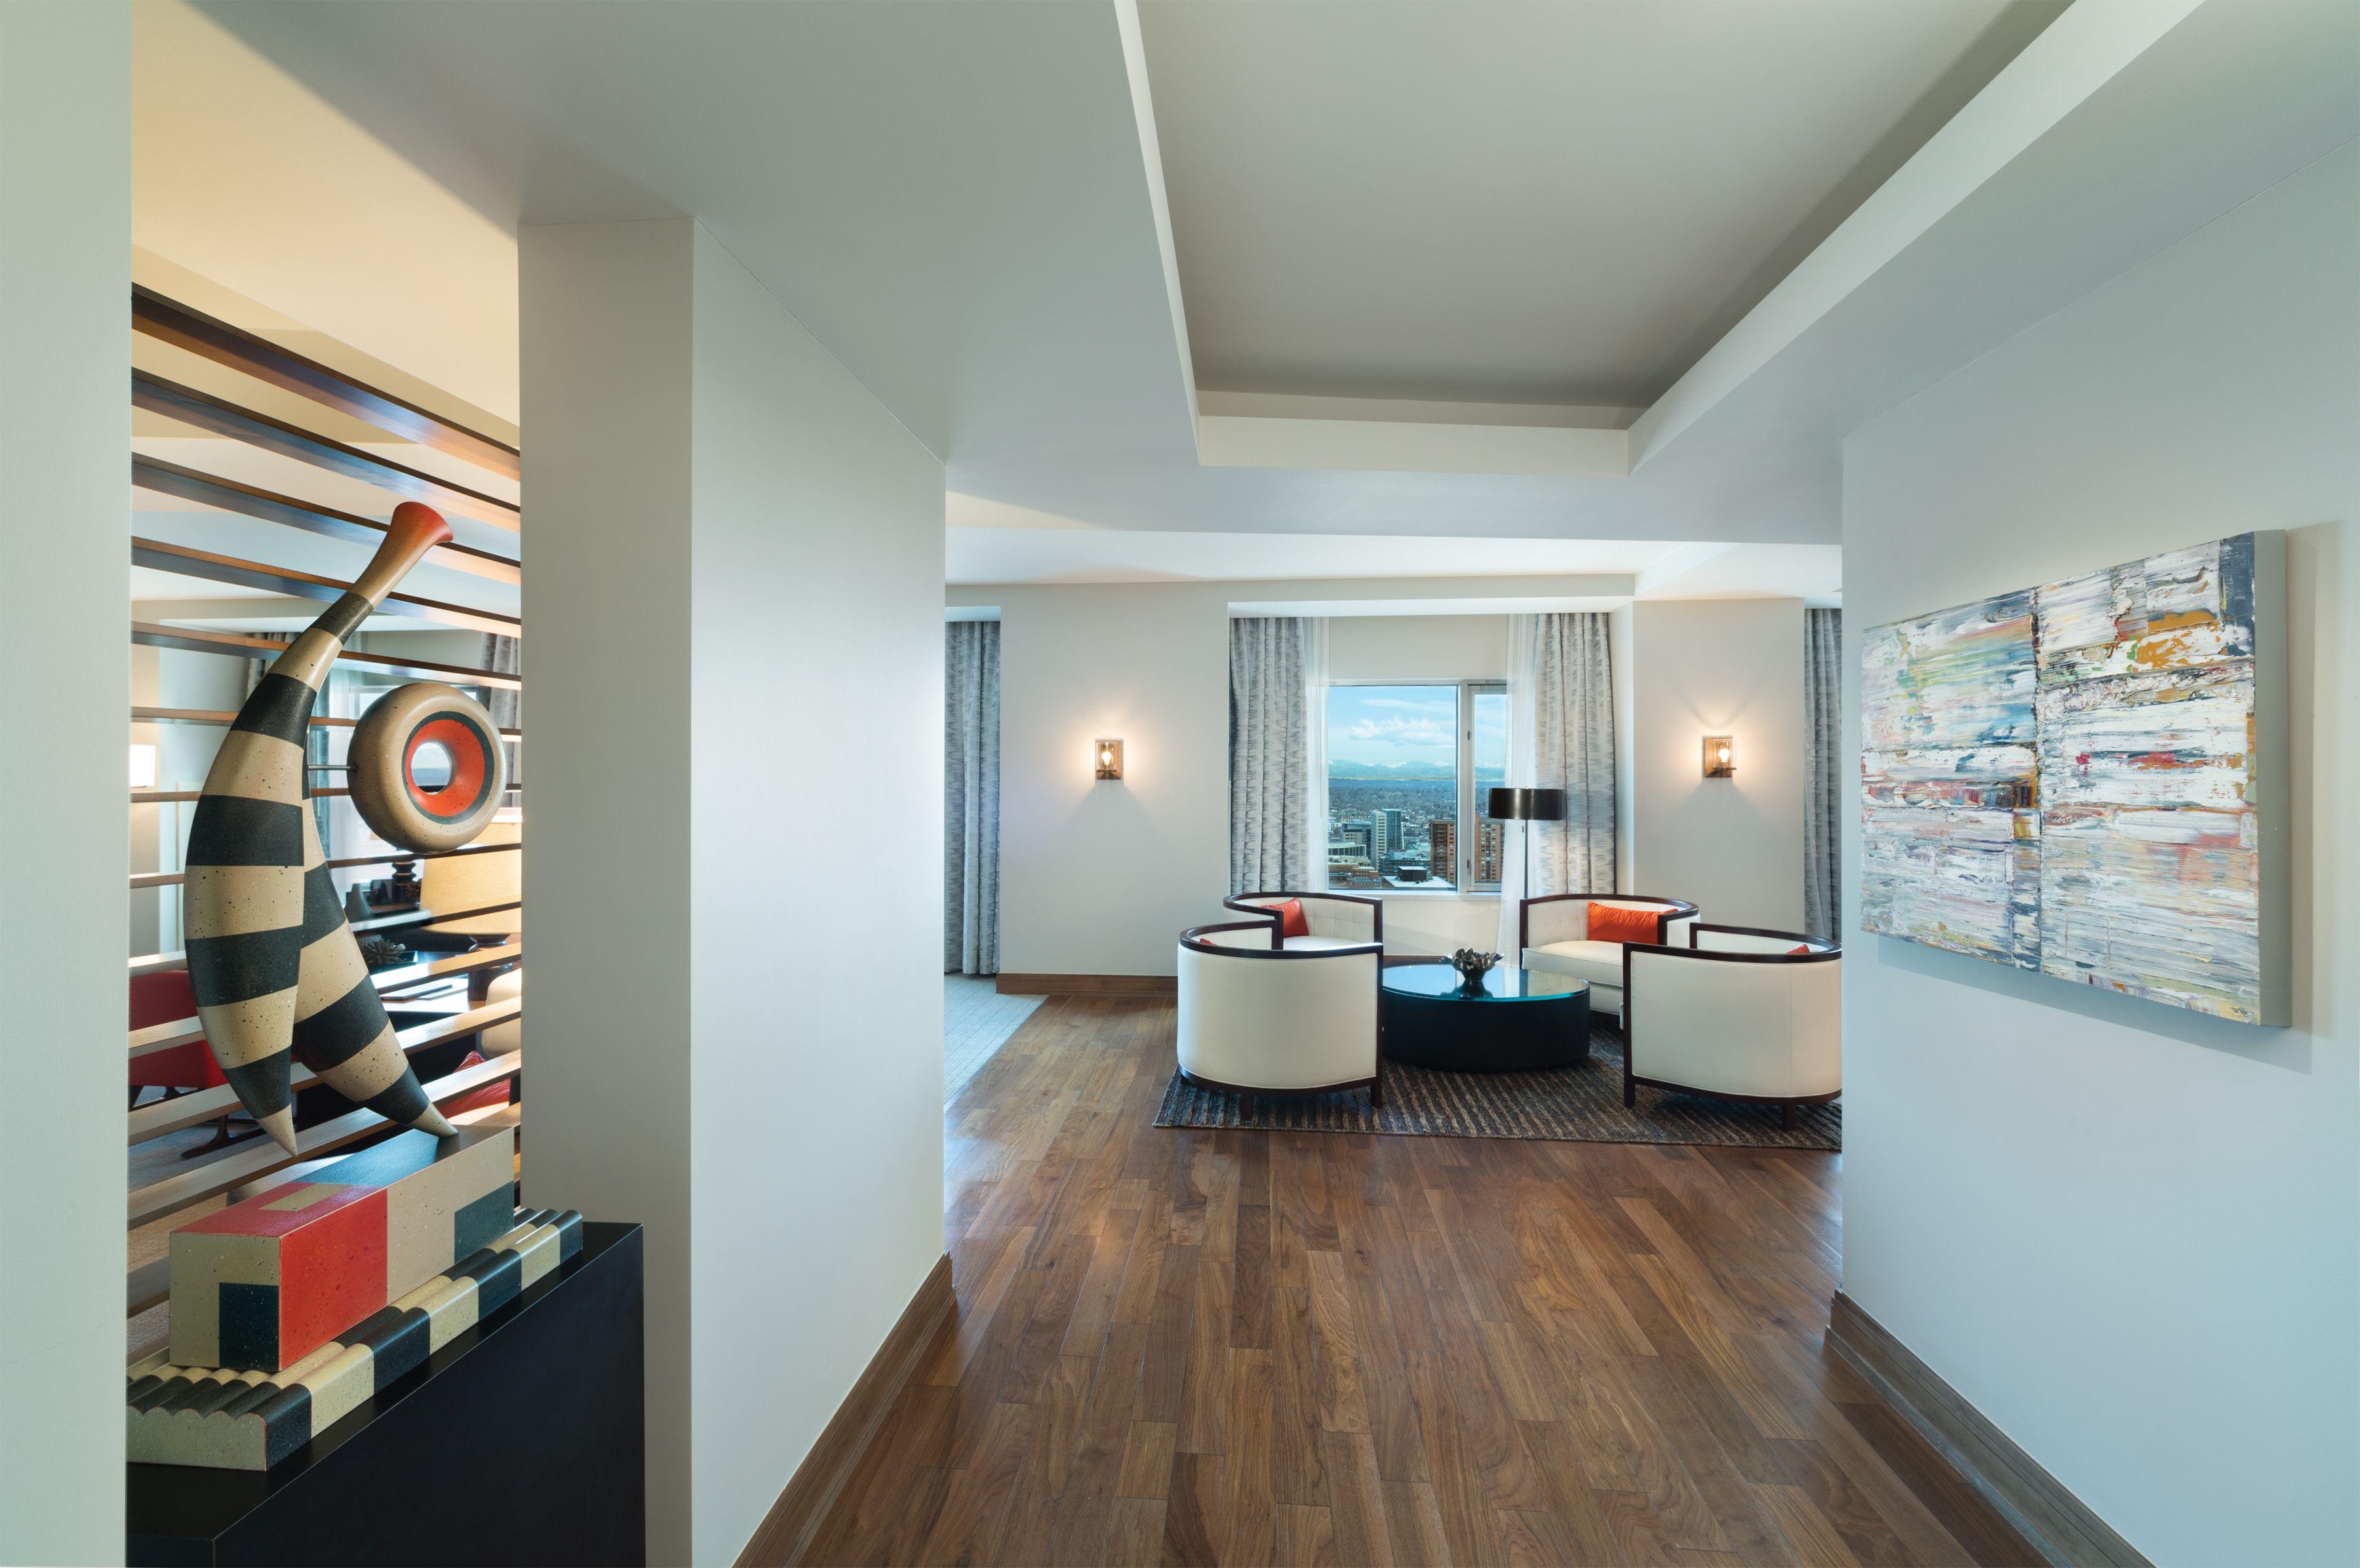 Hyatt S Premier Monarch Suite Hyatt Regency Denver Has Just